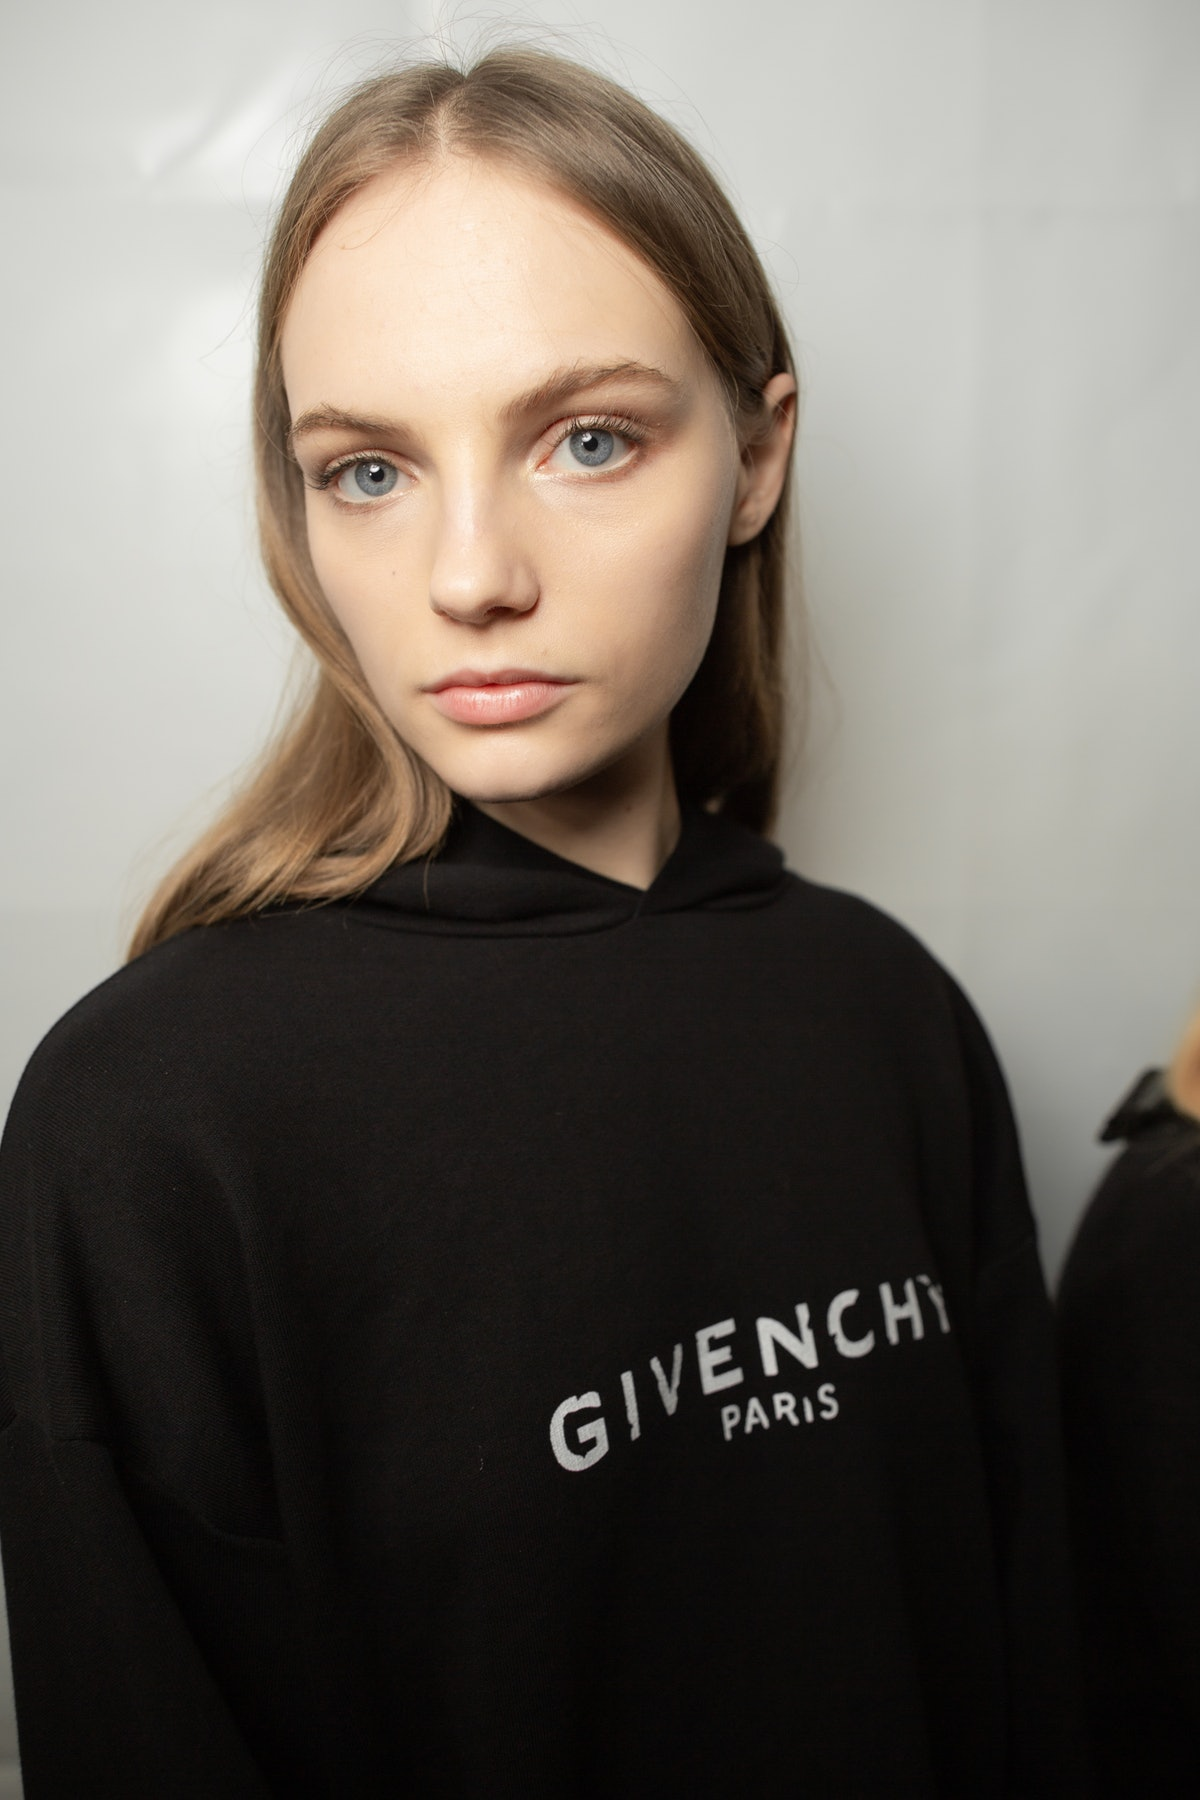 Serichai_Givenchy-018.jpg